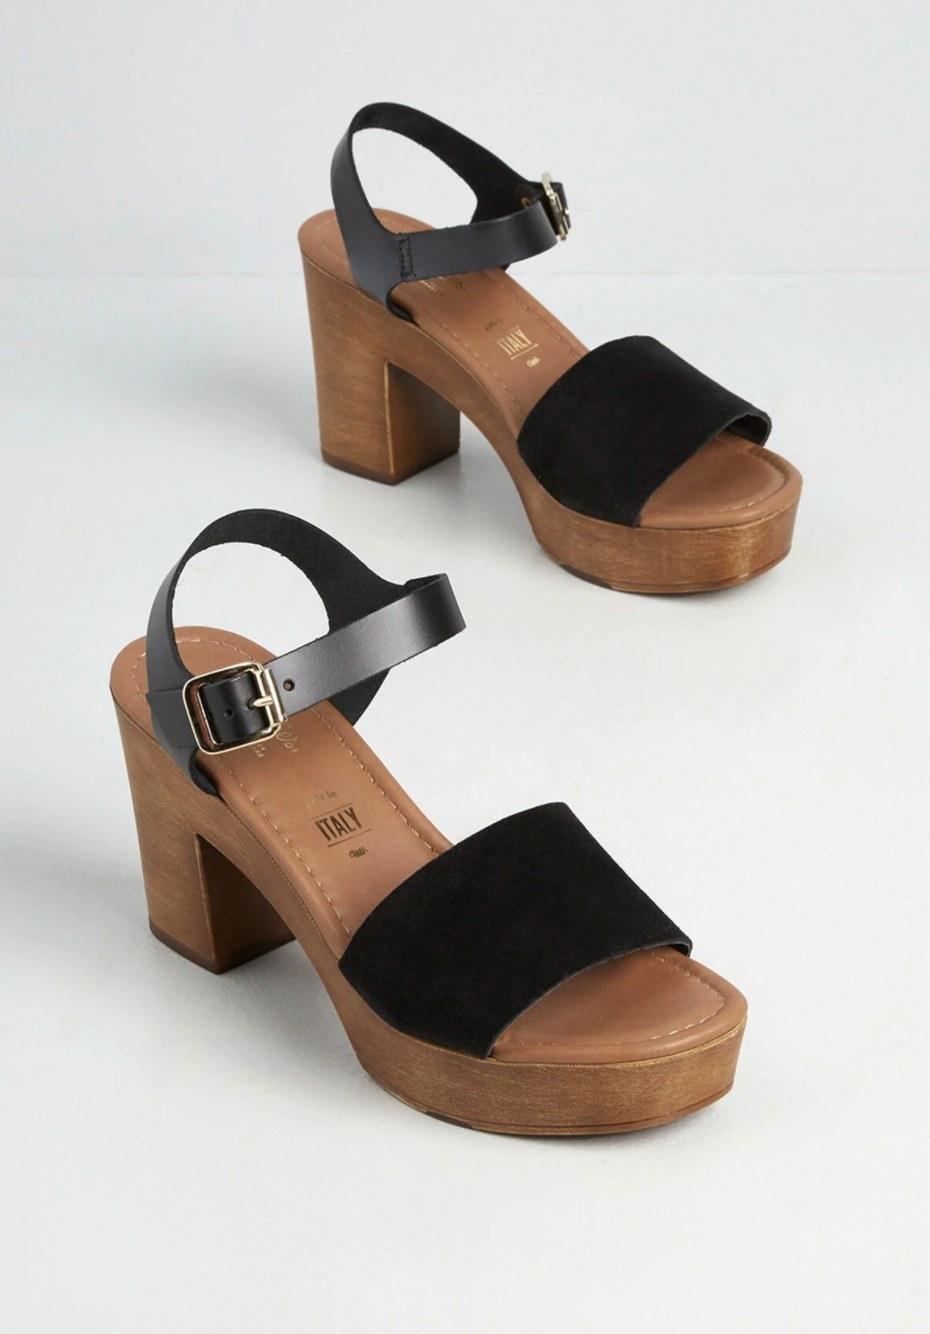 The platform sandals